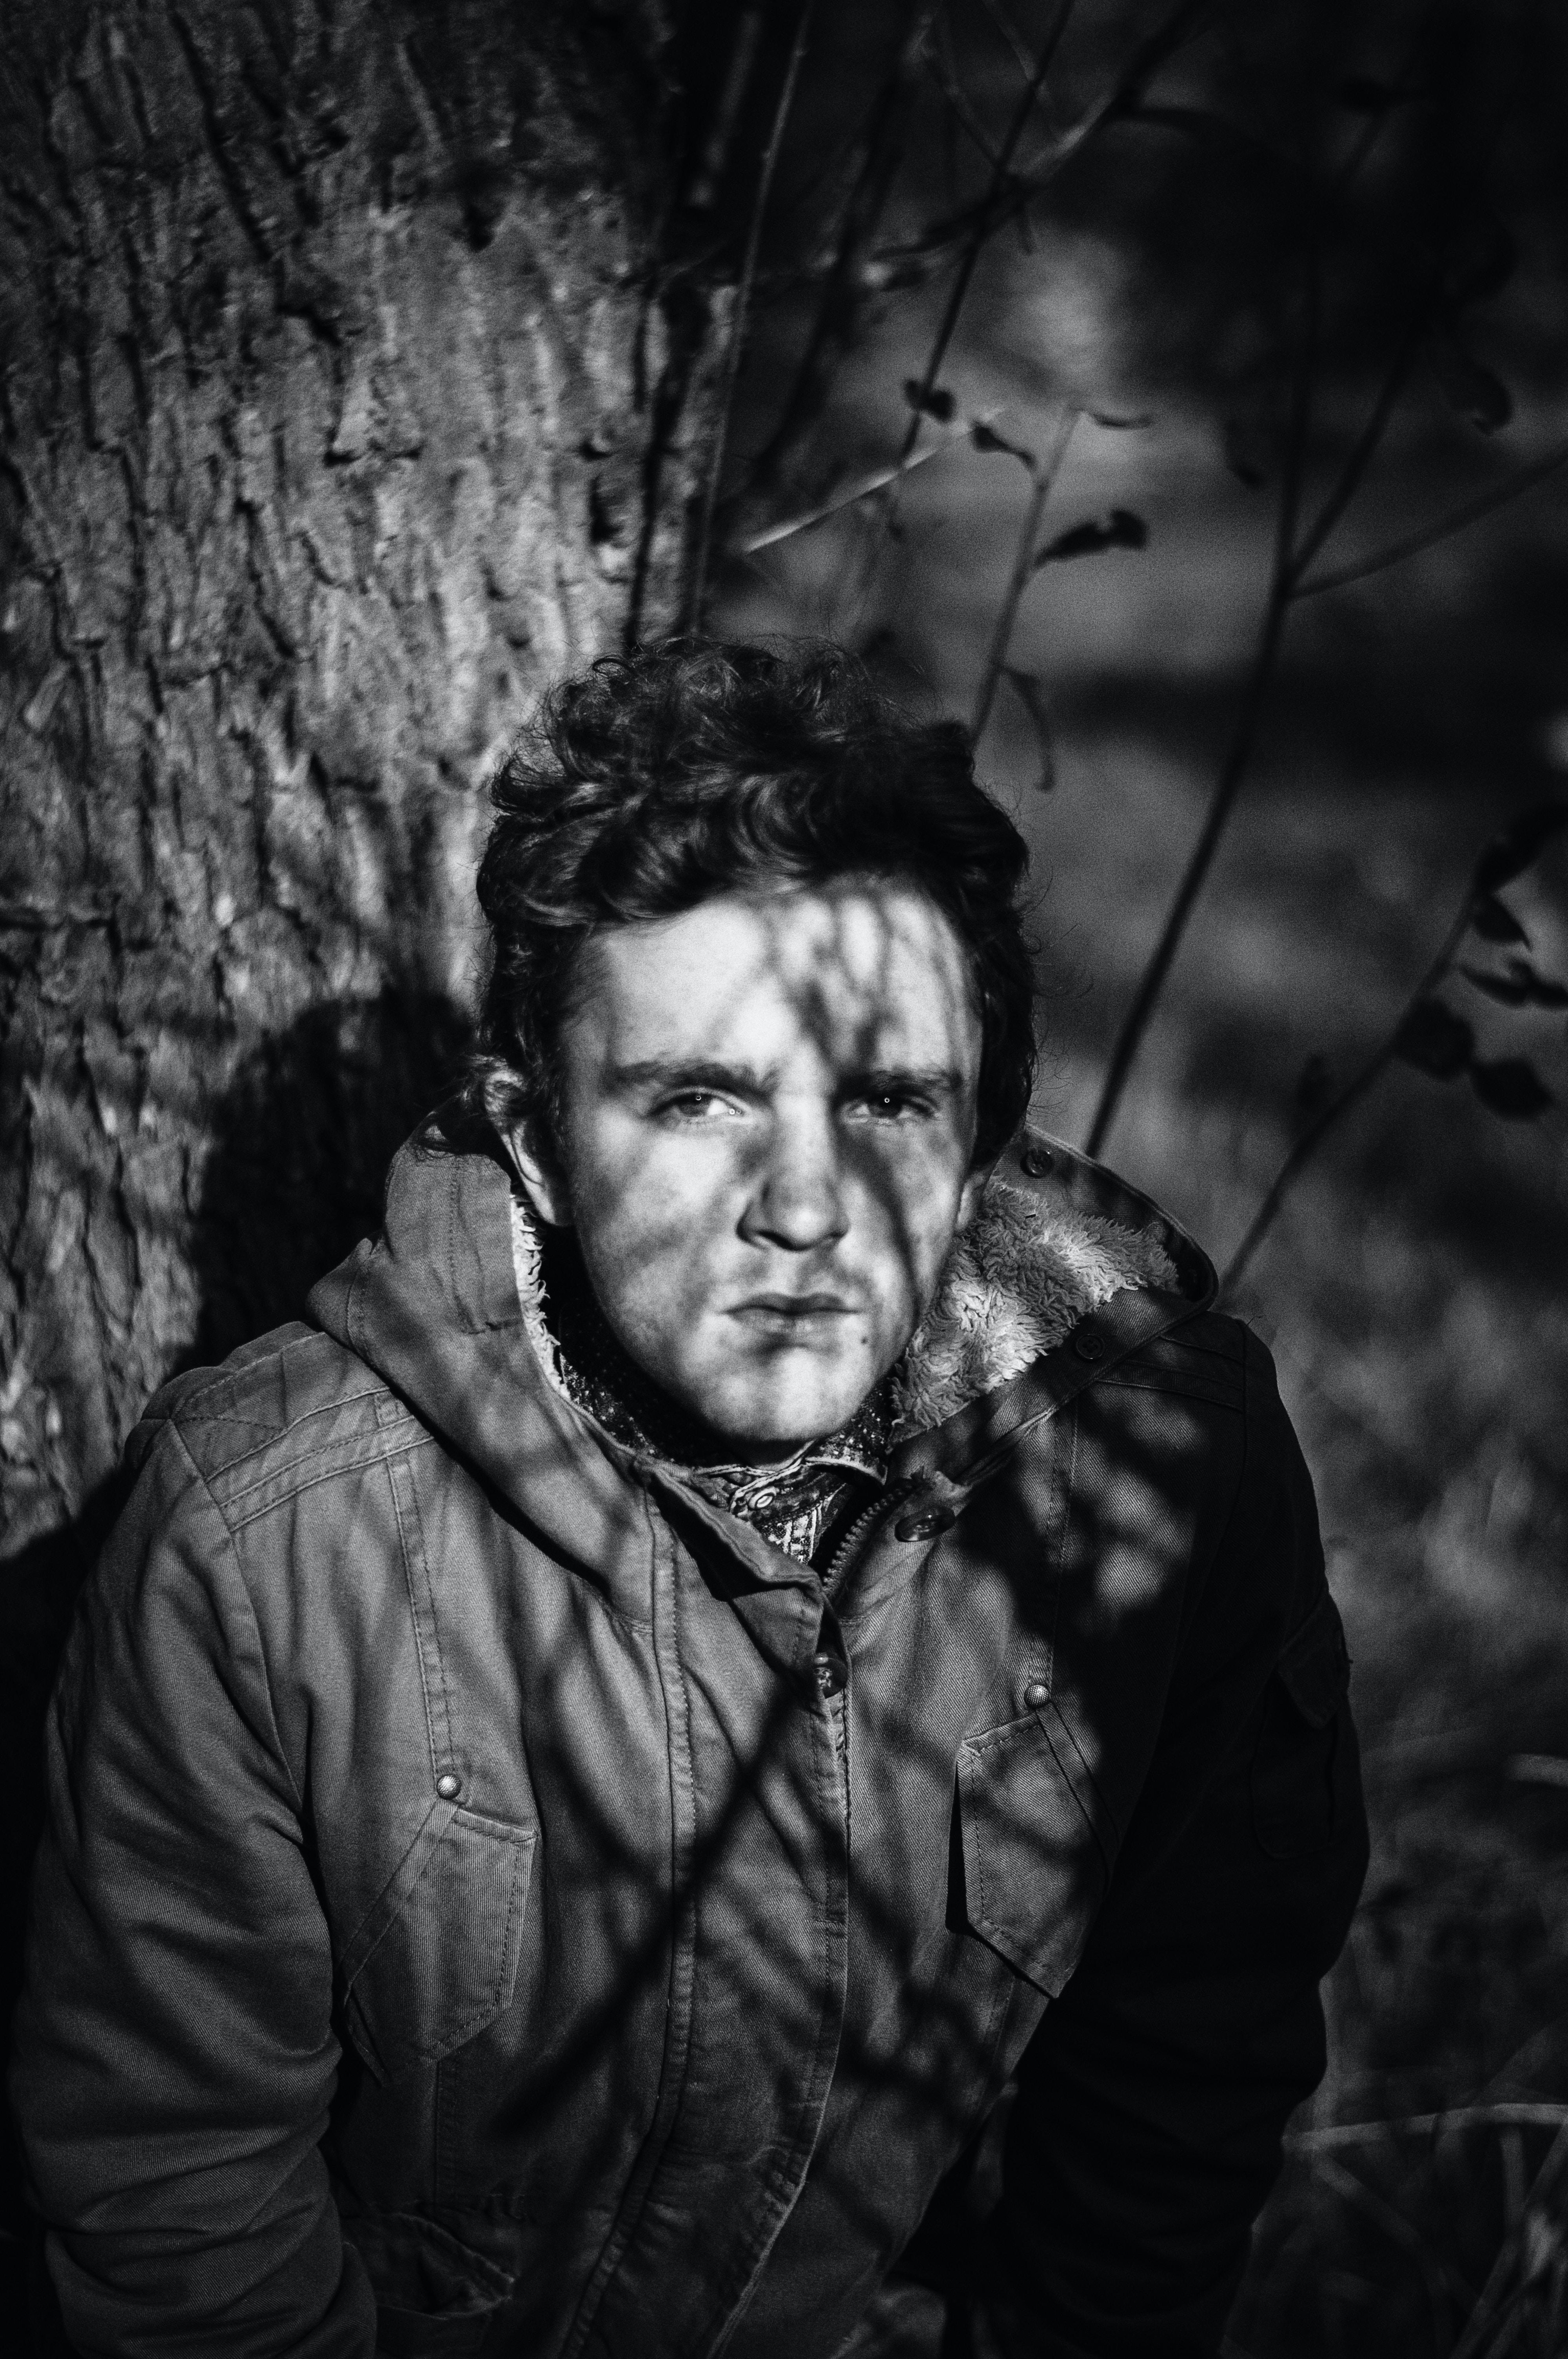 Black and white shot of man standing near trunk with shadow, Нью-Йорк, Техас, Соединенные Штаты Америки